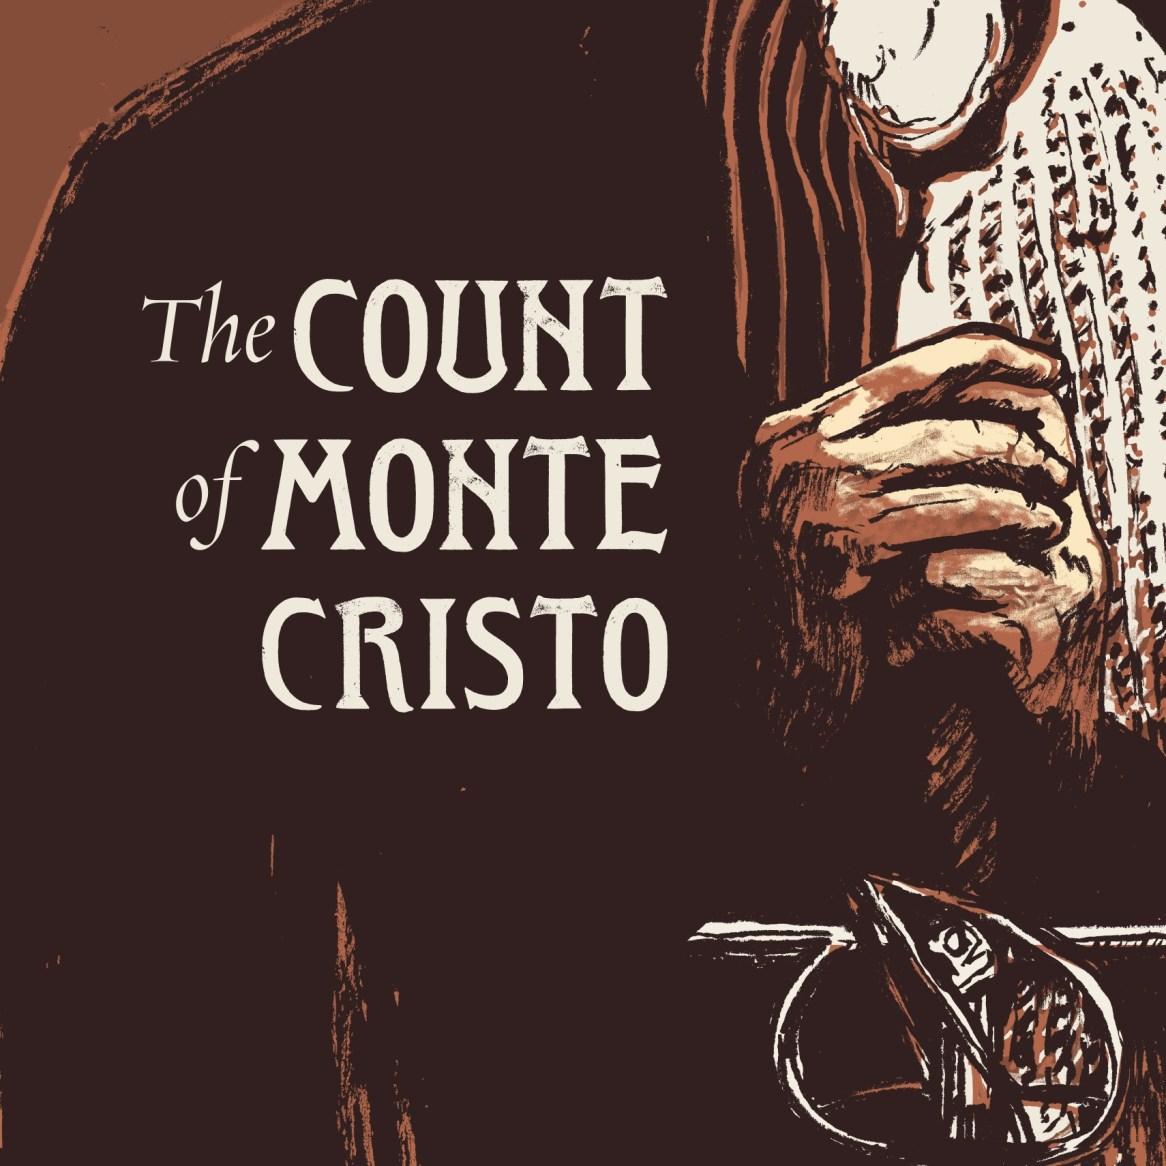 Alexandre Dumas, Count of Monte Cristo, Three Musketeers, Black Authors, KOLUMN Magazine, KOLUMN